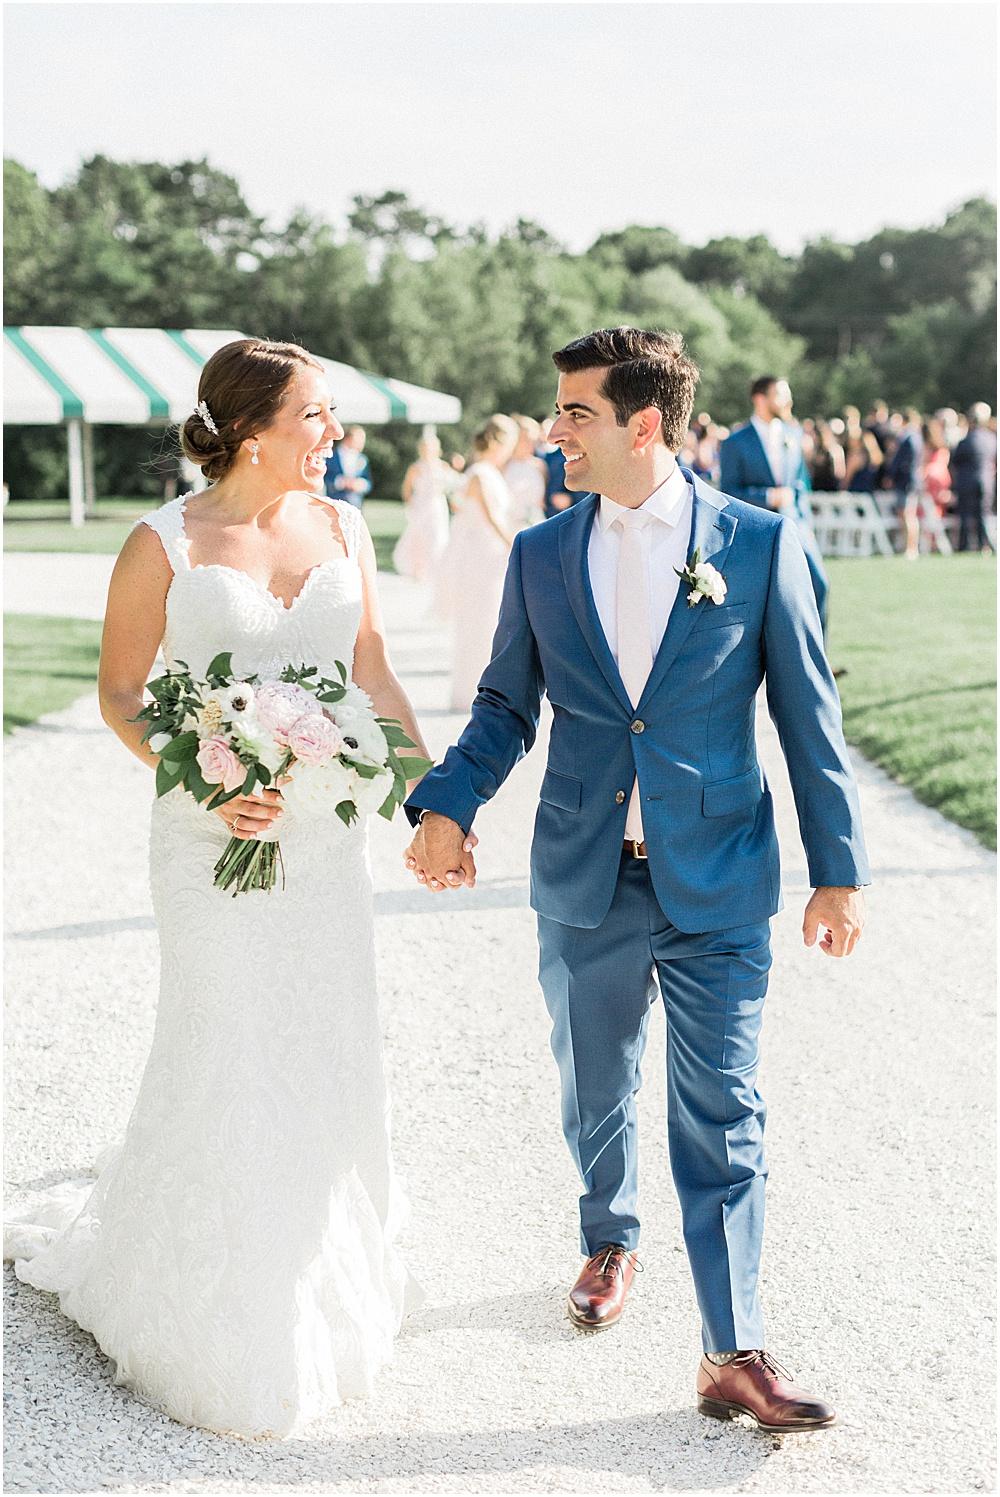 willowbend_country_club_colleen_brett_wild_dahlia_cw_events_cape_cod_massachusetts_boston_wedding_photographer_meredith_jane_photography_photo_0595.jpg